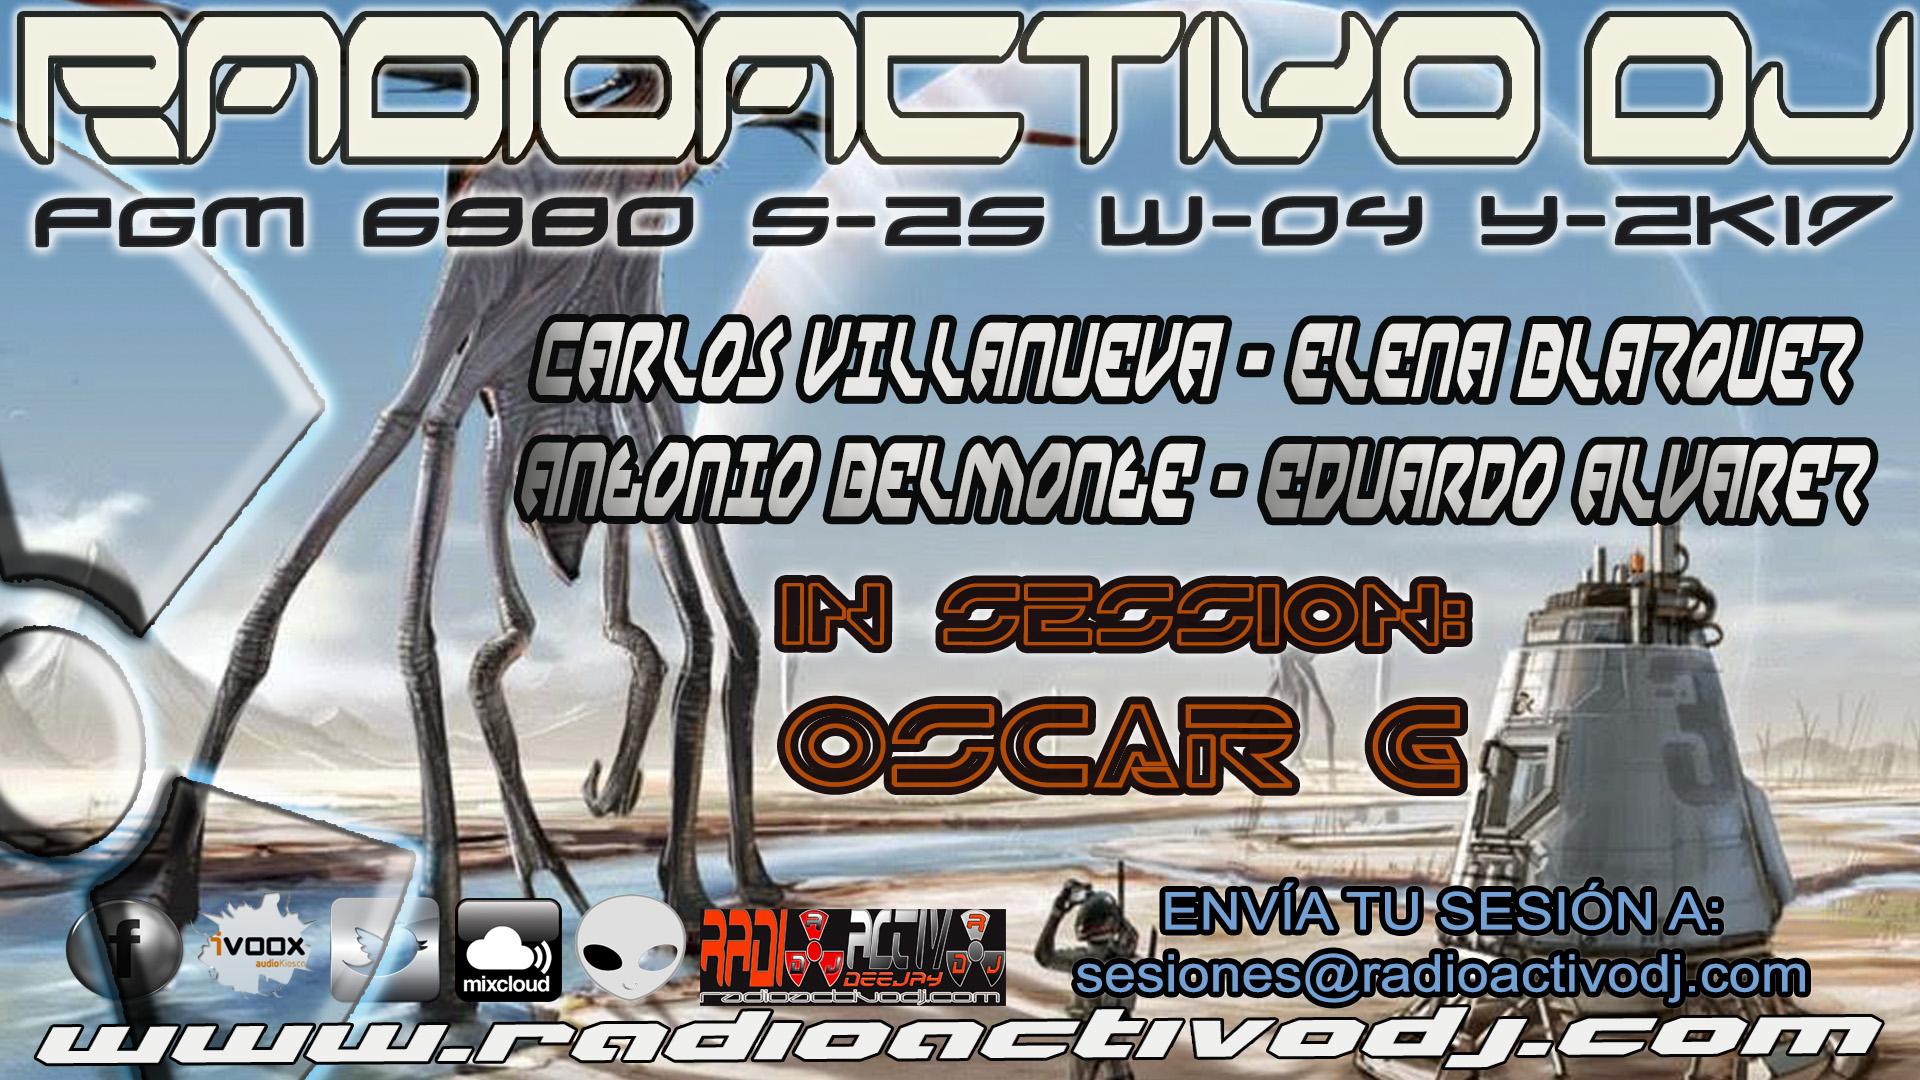 RADIOACTIVO DJ 04-2017